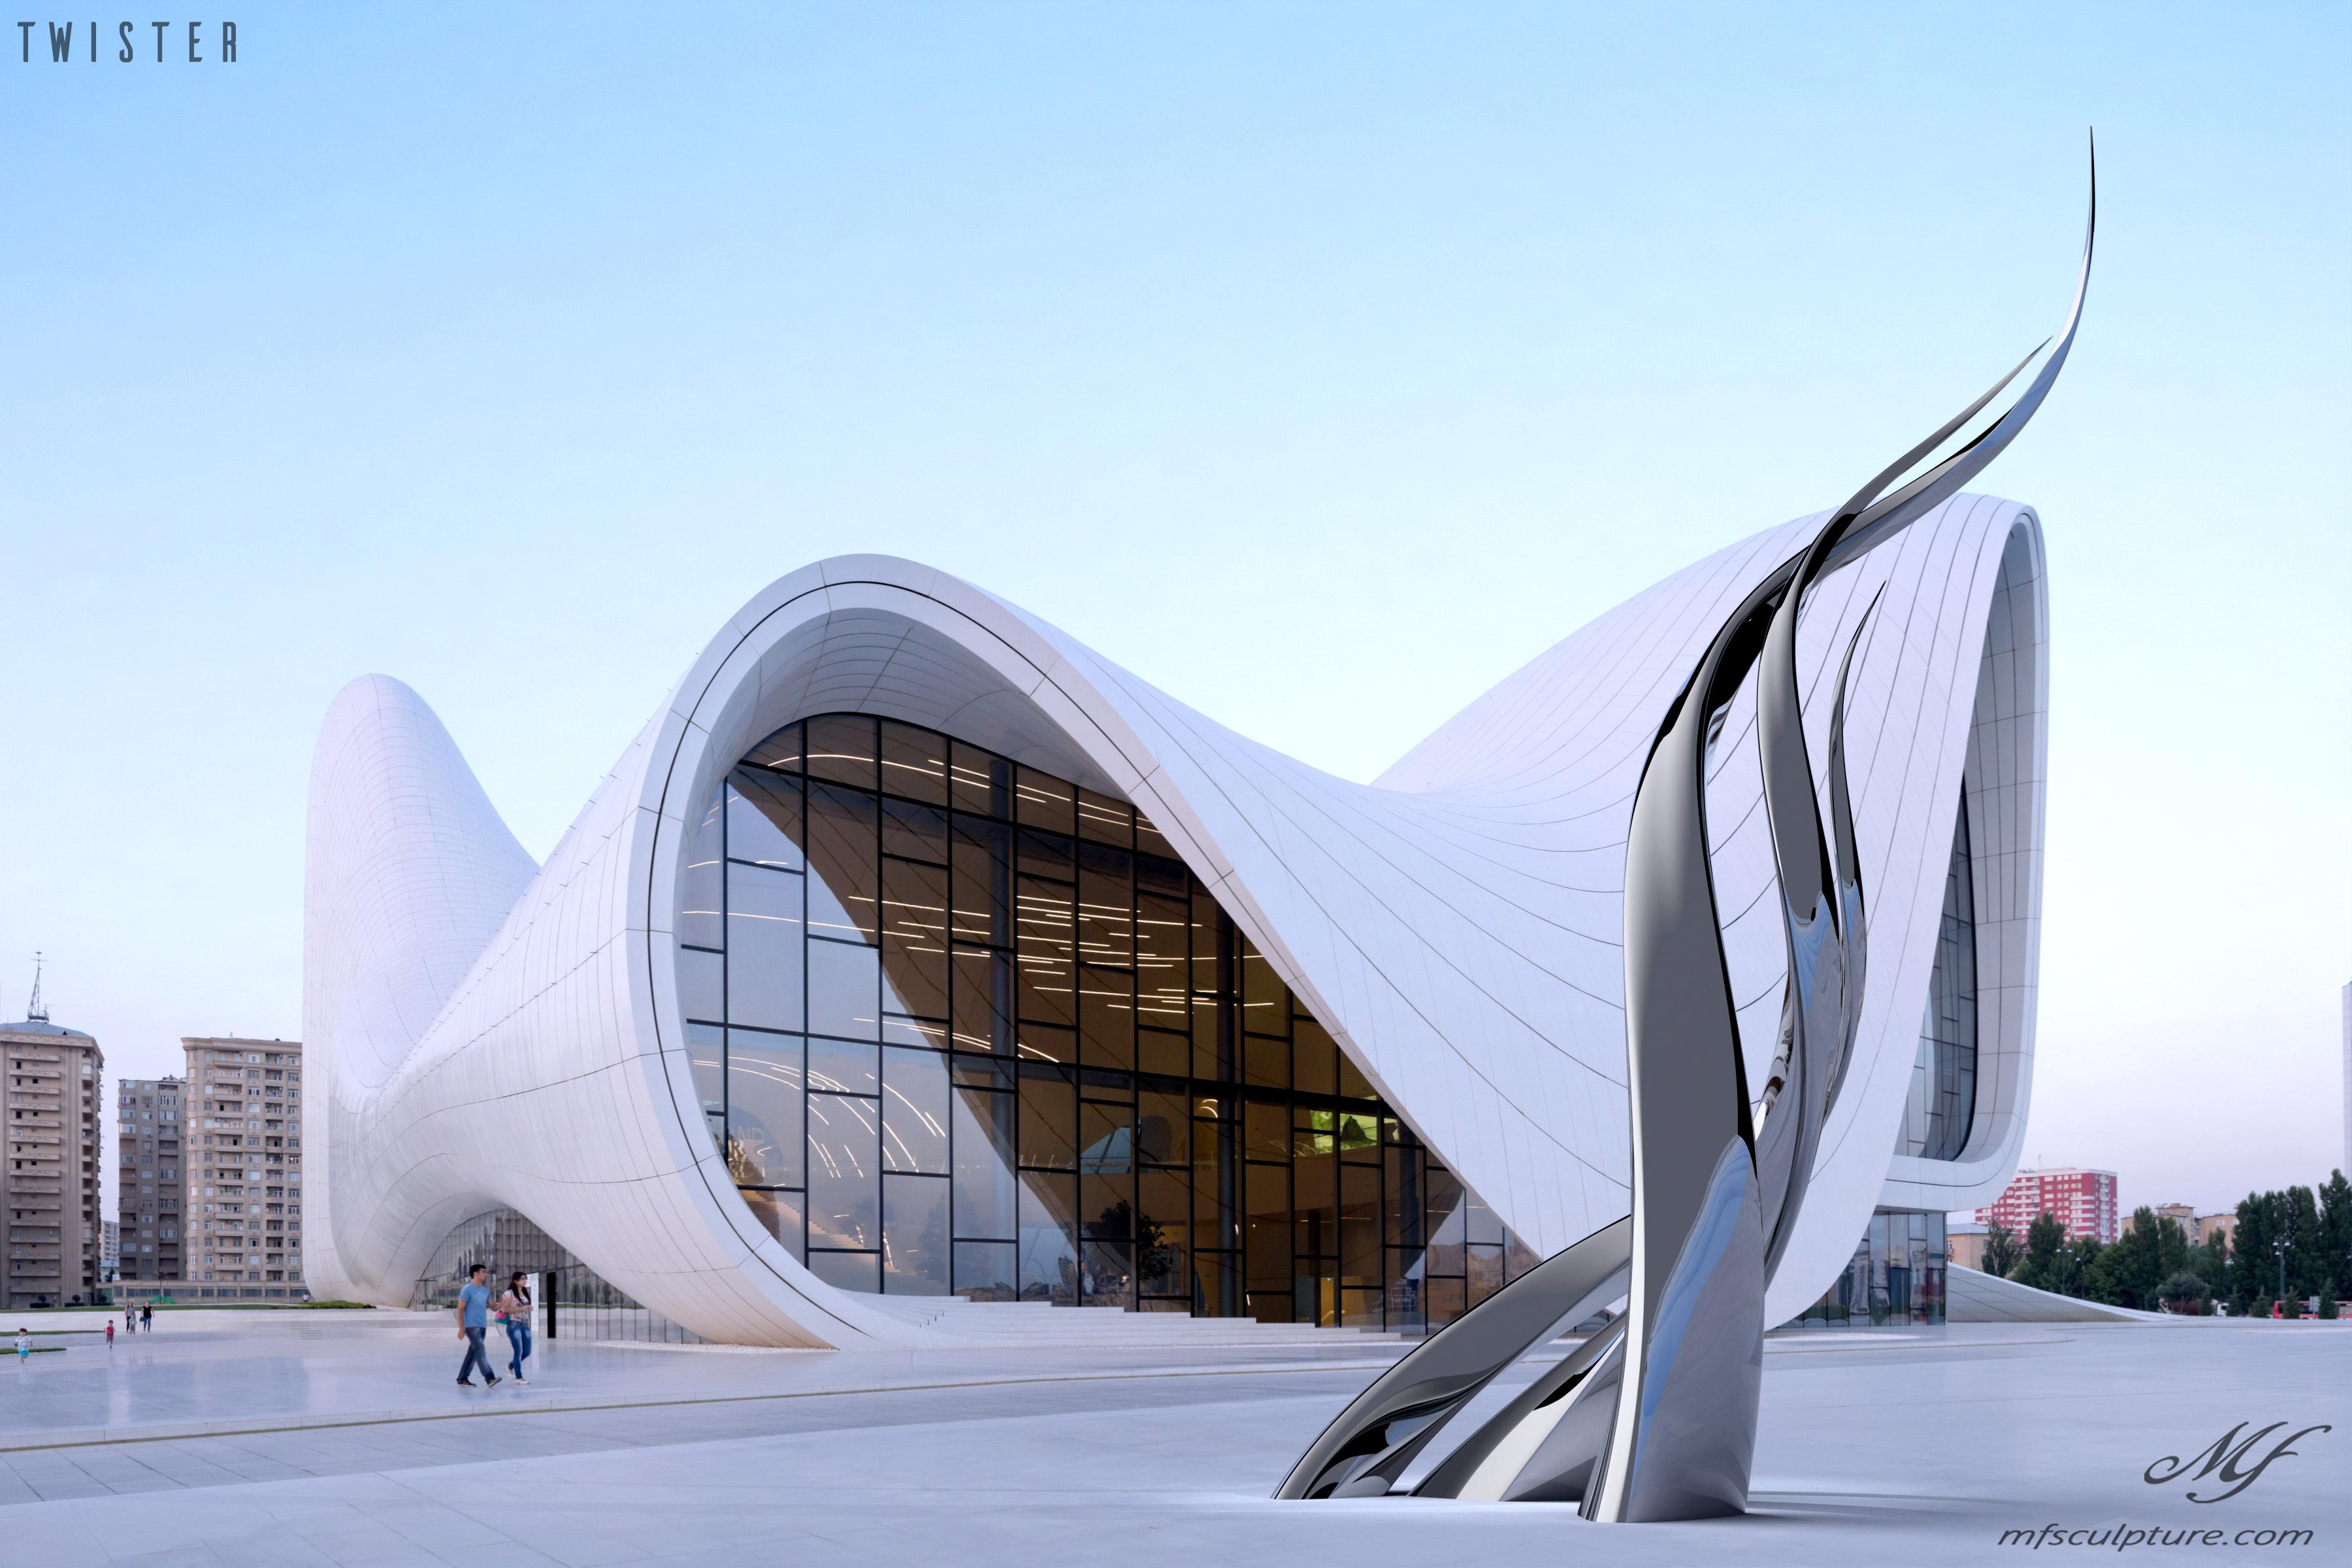 Heydar Aliyev Zaha Hadid Modern Sculpture Public Art Twister 2